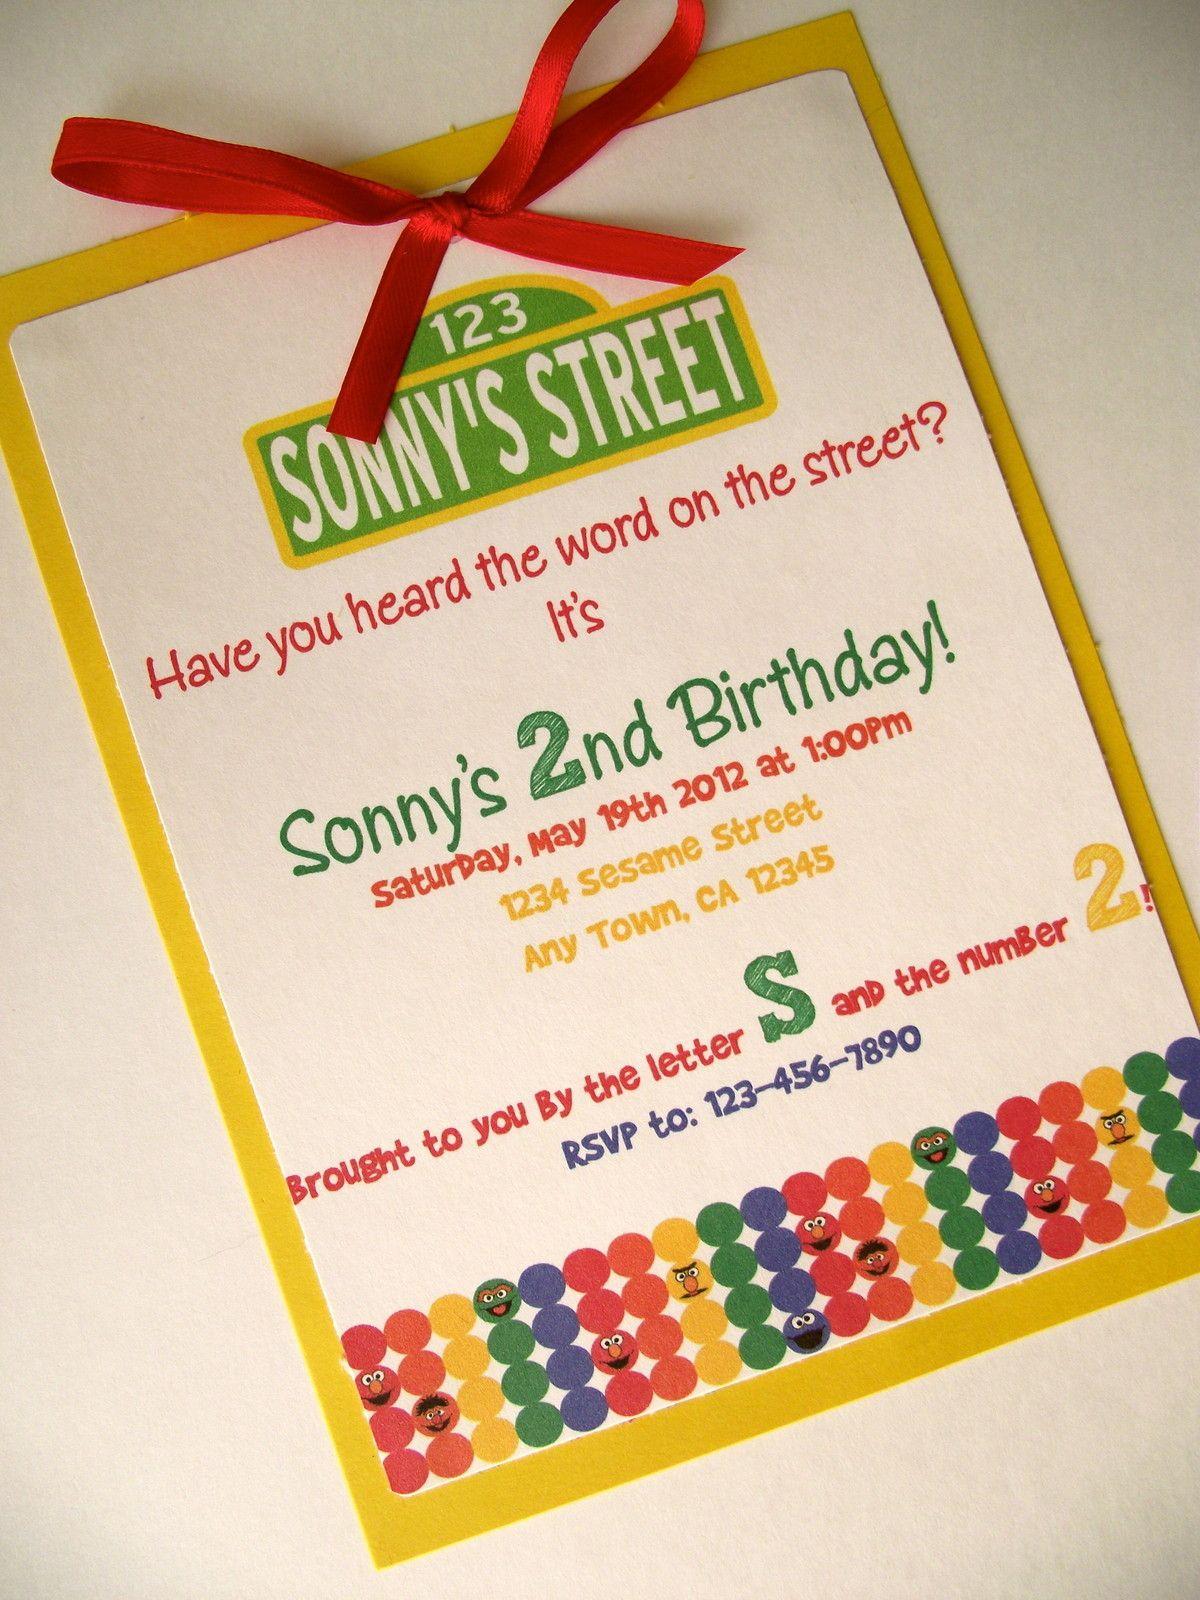 Elmo party invitelove the wording sesame street